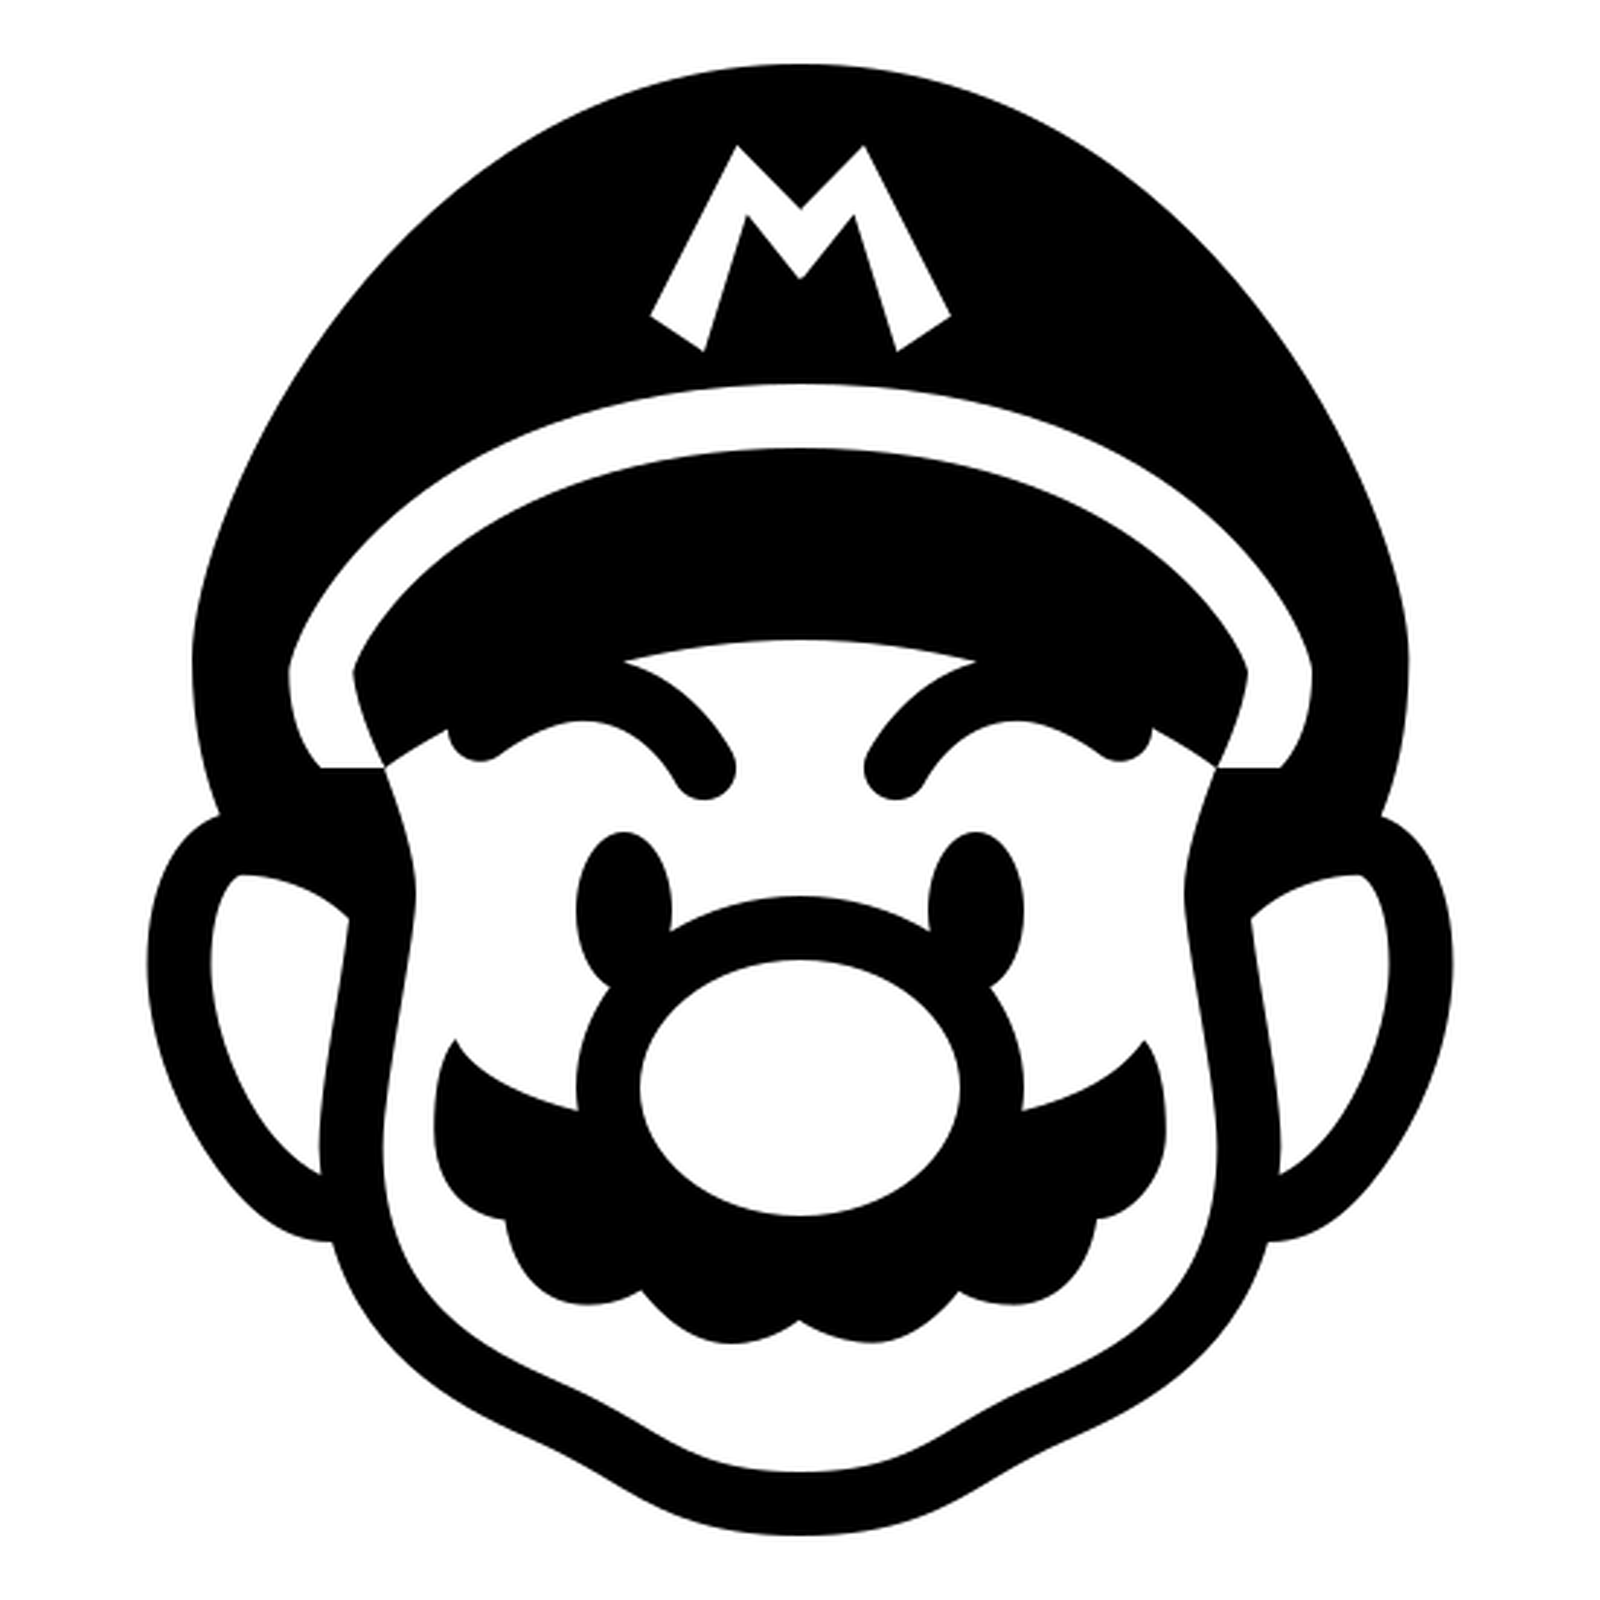 Super Mario Filled icon